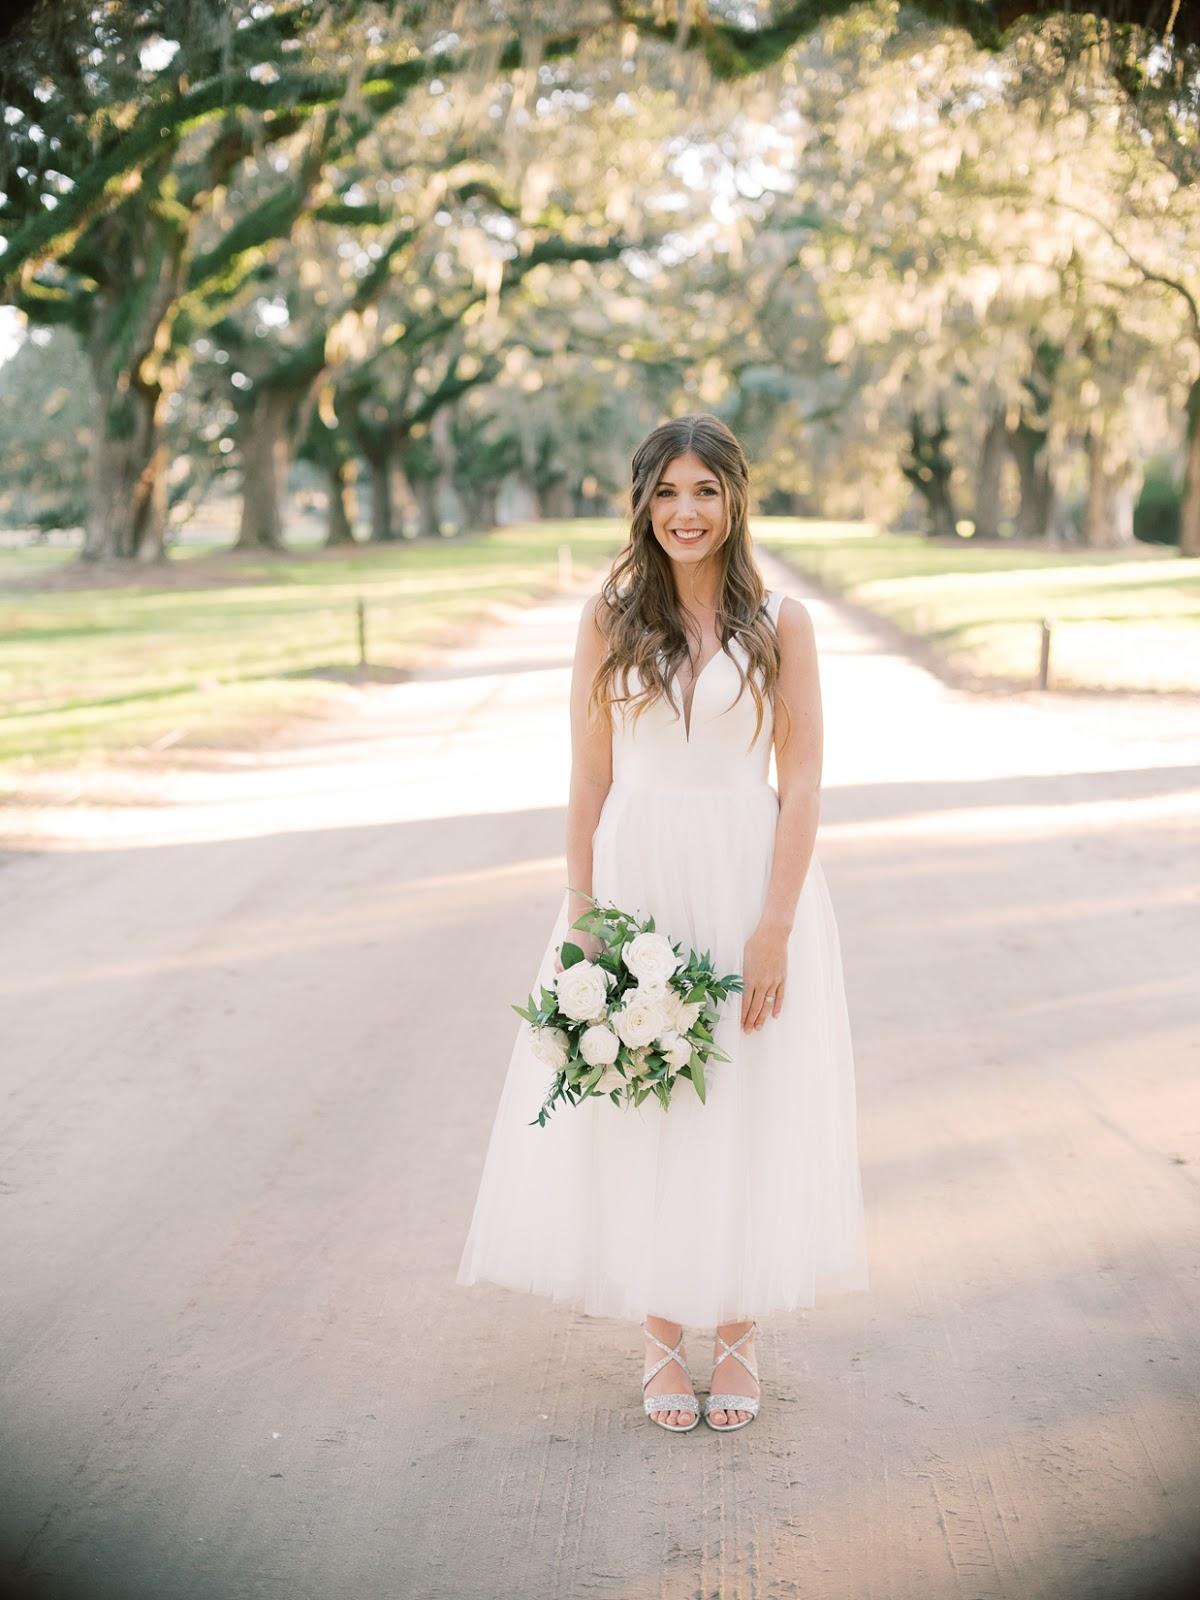 Reception Wedding Dress Details - Chasing Cinderella